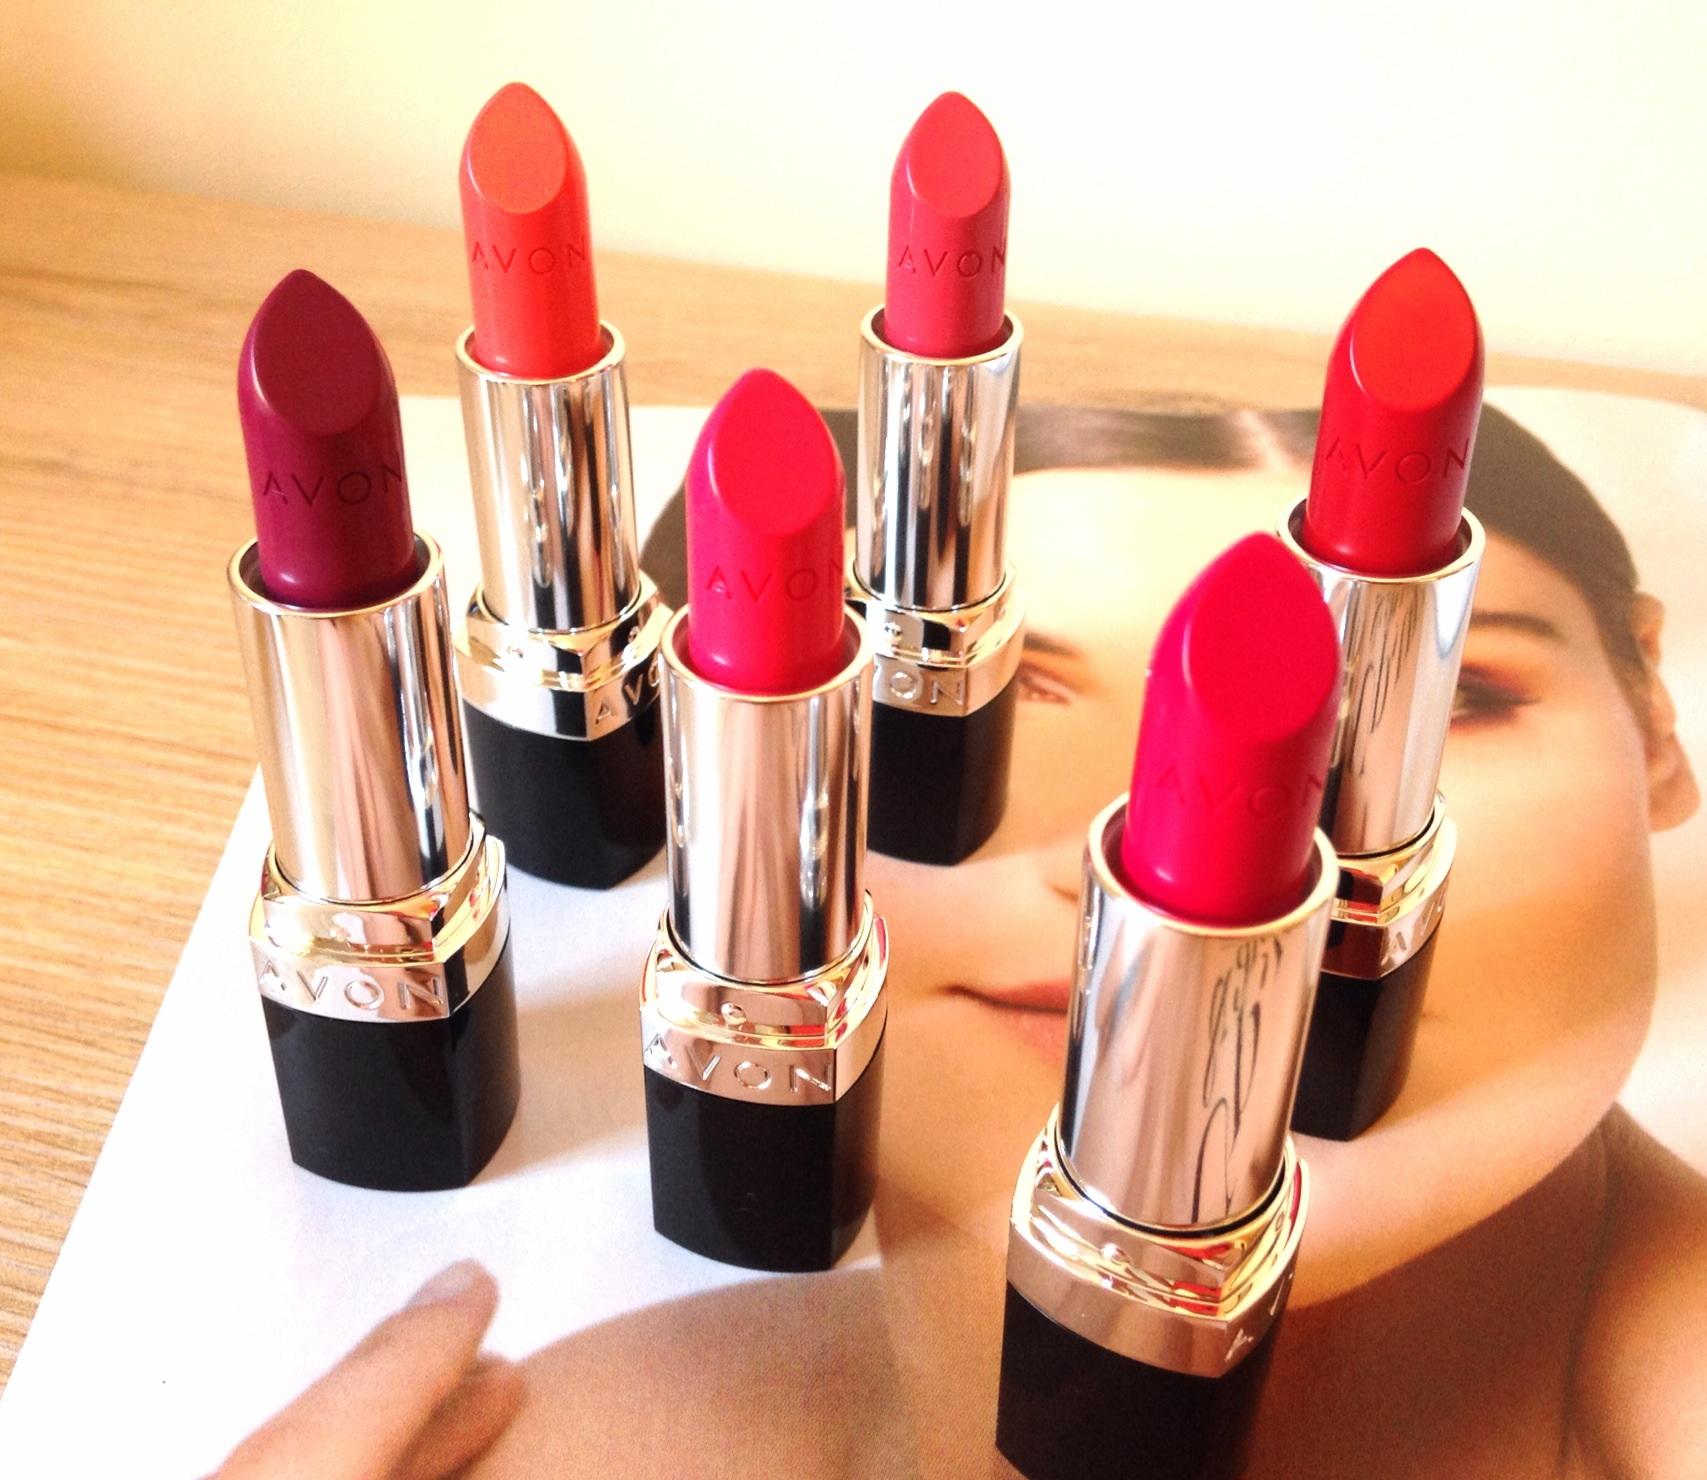 New Product Alert Avon Ultra Colour Bold Lipsticks Just Becky